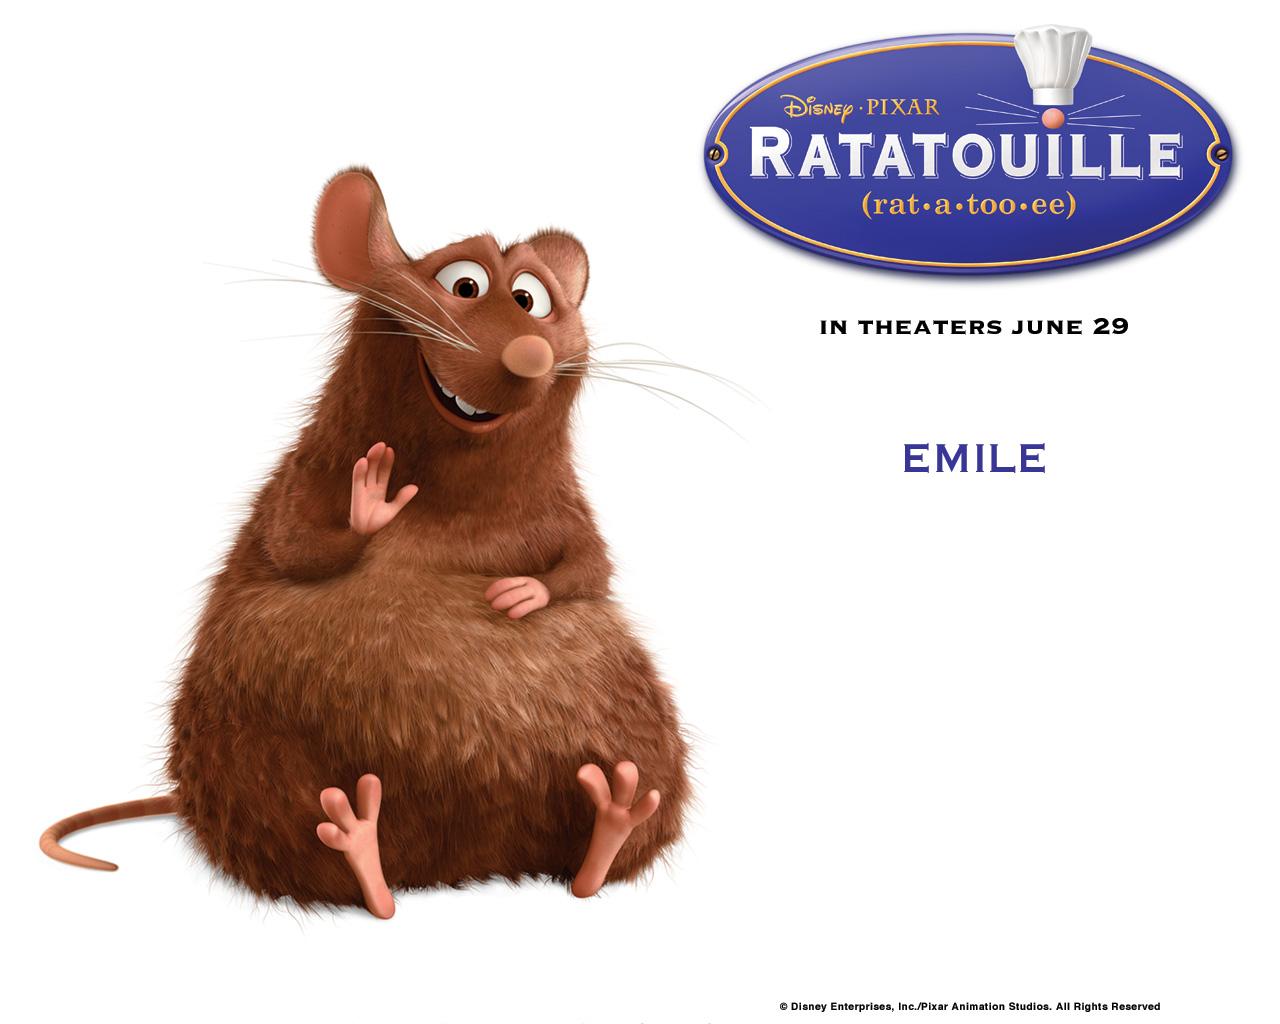 http://1.bp.blogspot.com/--ouxriQlR8o/TcEmS0AduGI/AAAAAAAAAGo/PRybdDZhydc/s1600/Ratatouille_Wallpaper_3.jpg